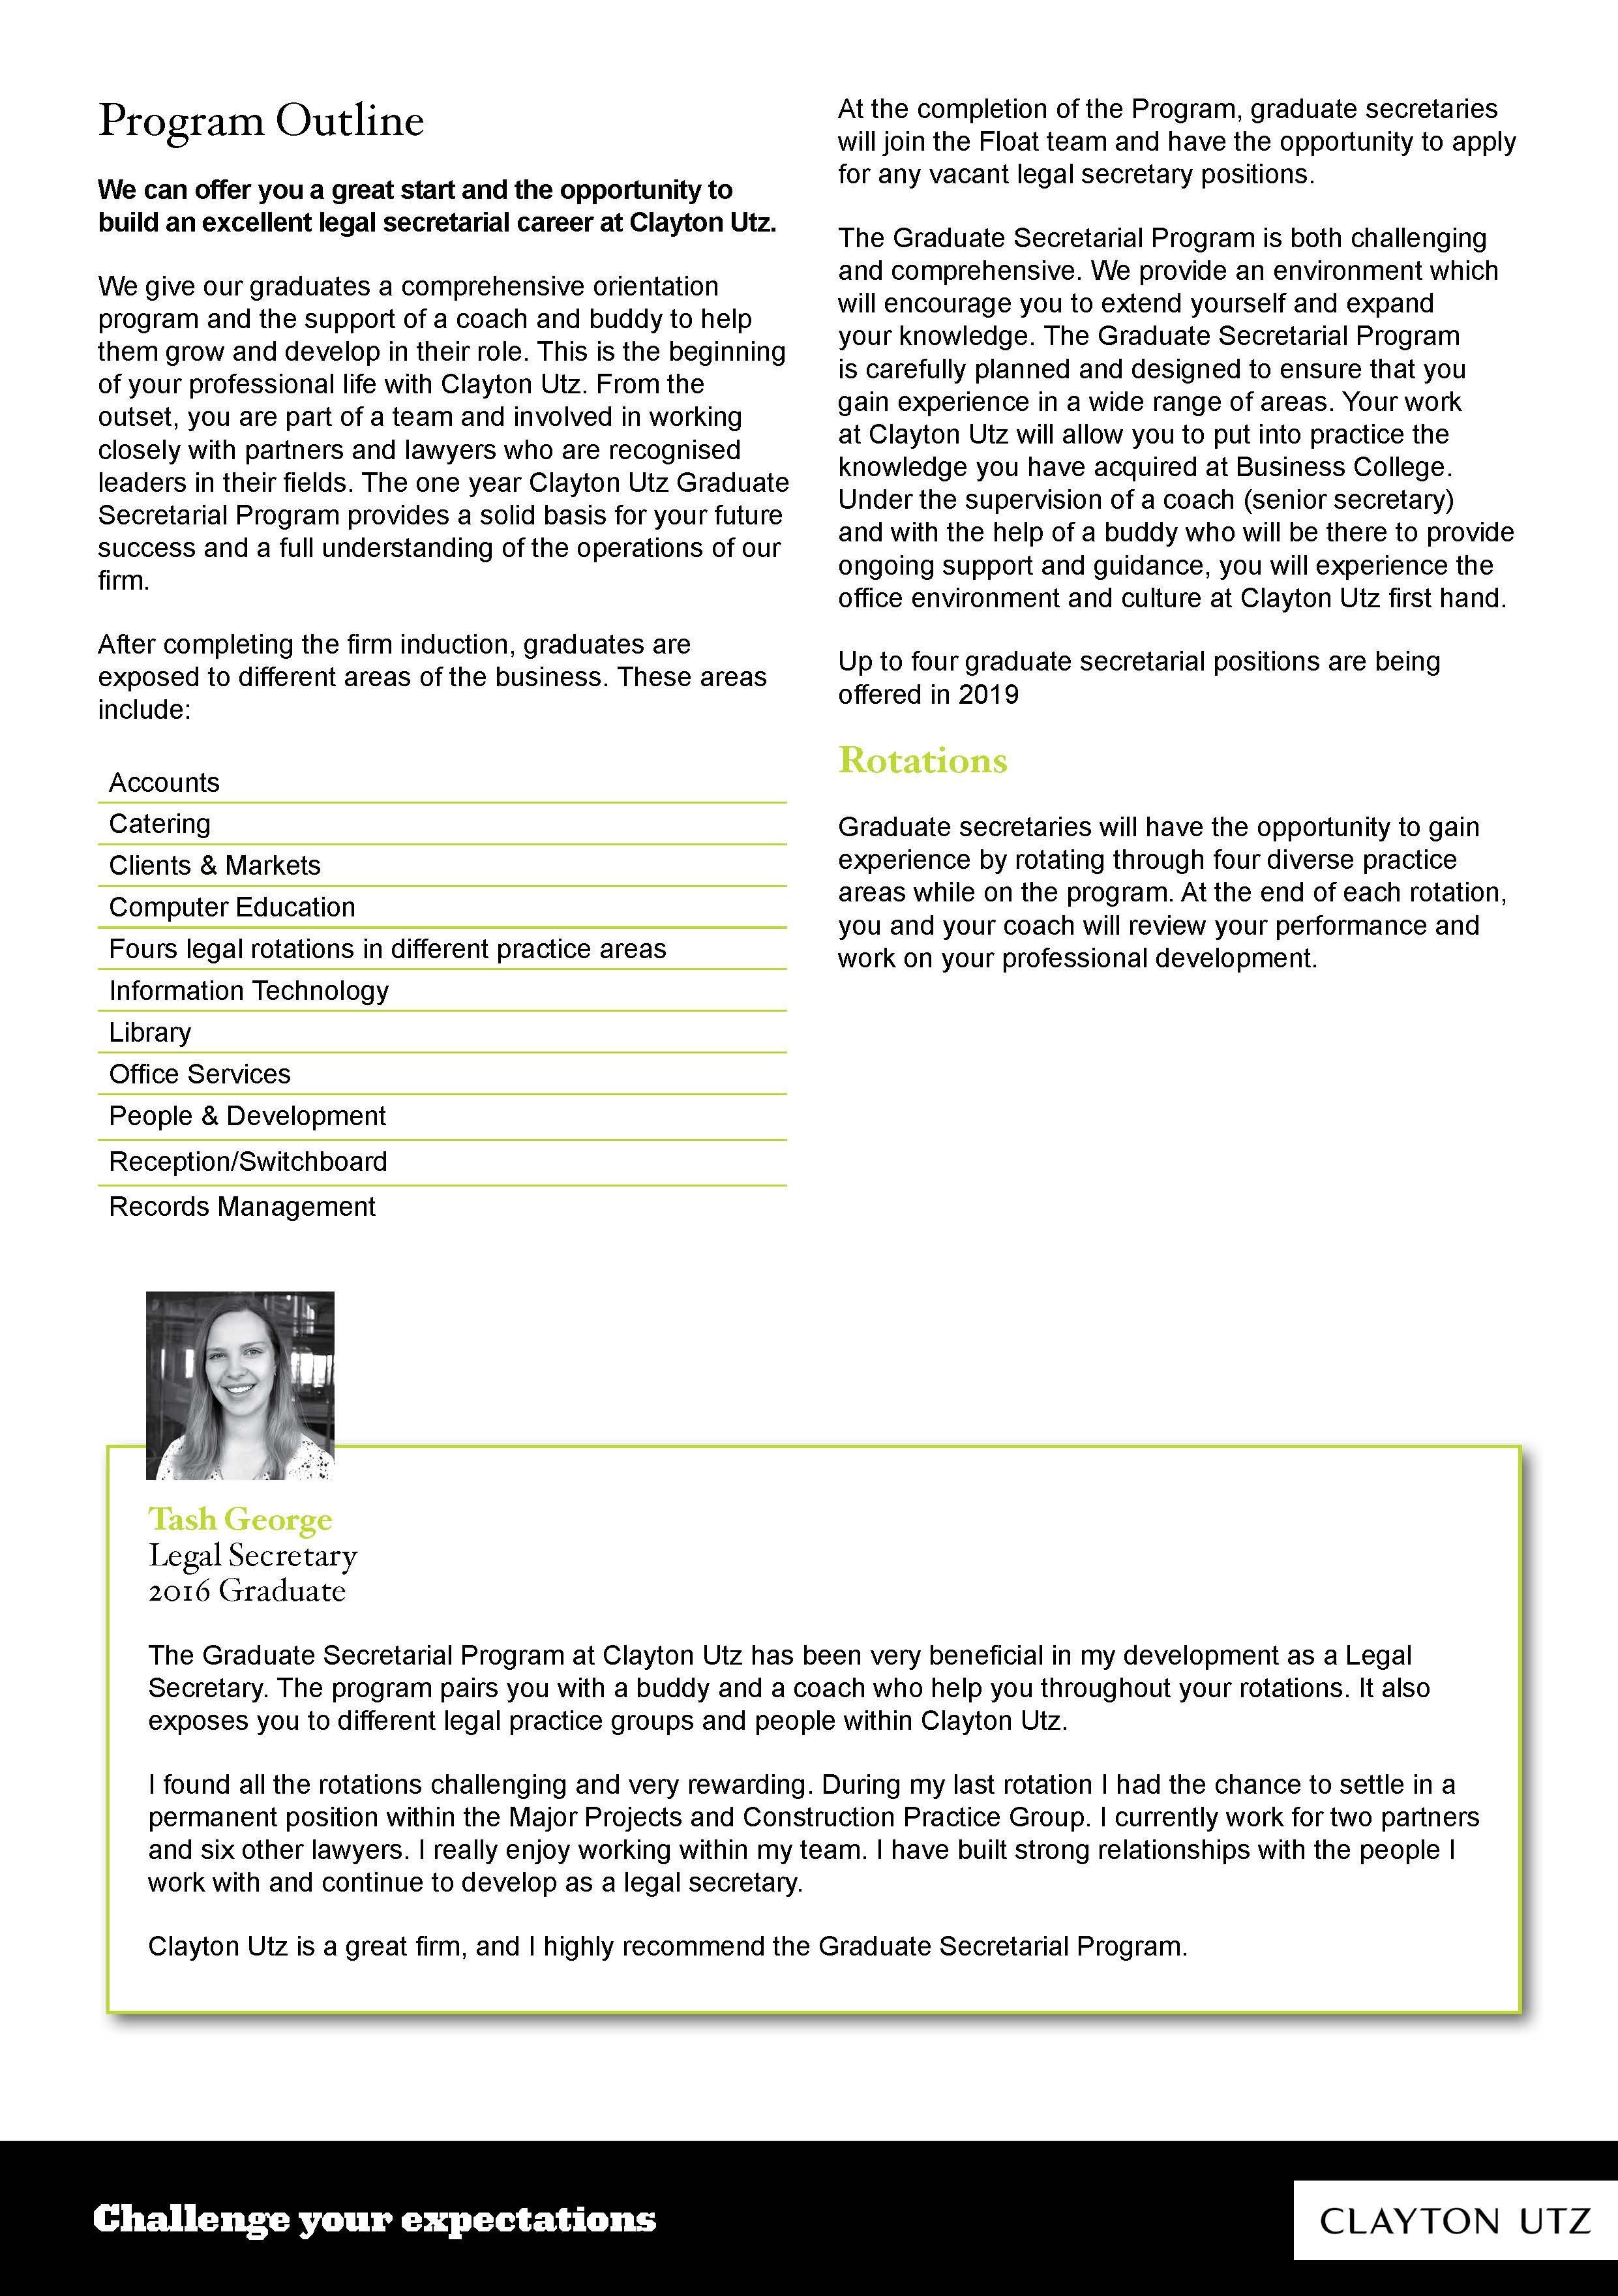 Clayton Utz Graduate_Secretarial_Program_Sydney_2019_Page_5.jpg